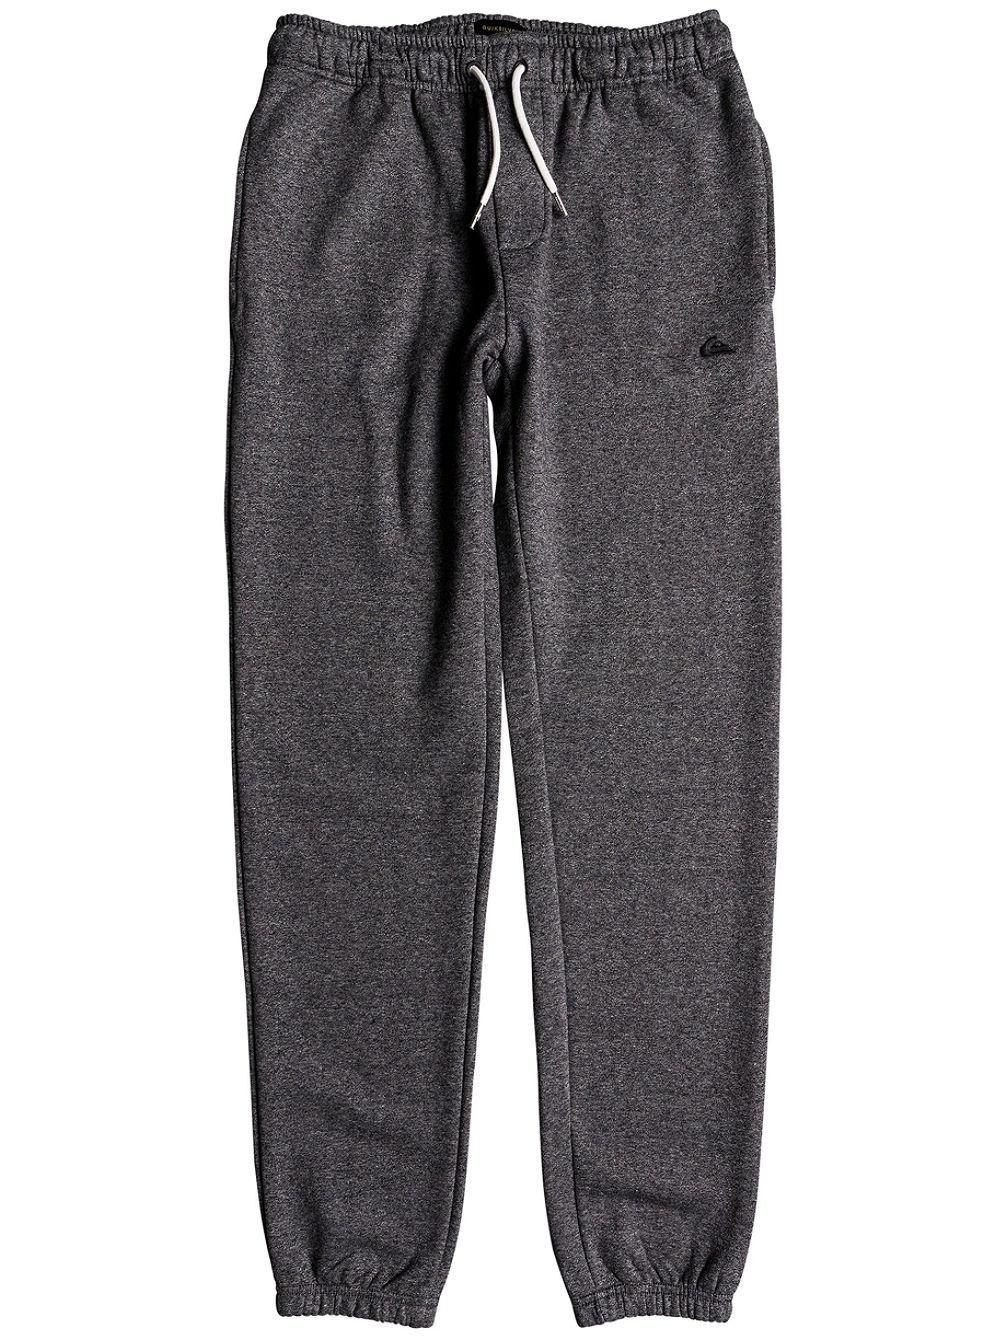 Compra Quiksilver Shadow Everyday Pantalones de chándal en línea en  blue-tomato.com 306fcdc37b8b